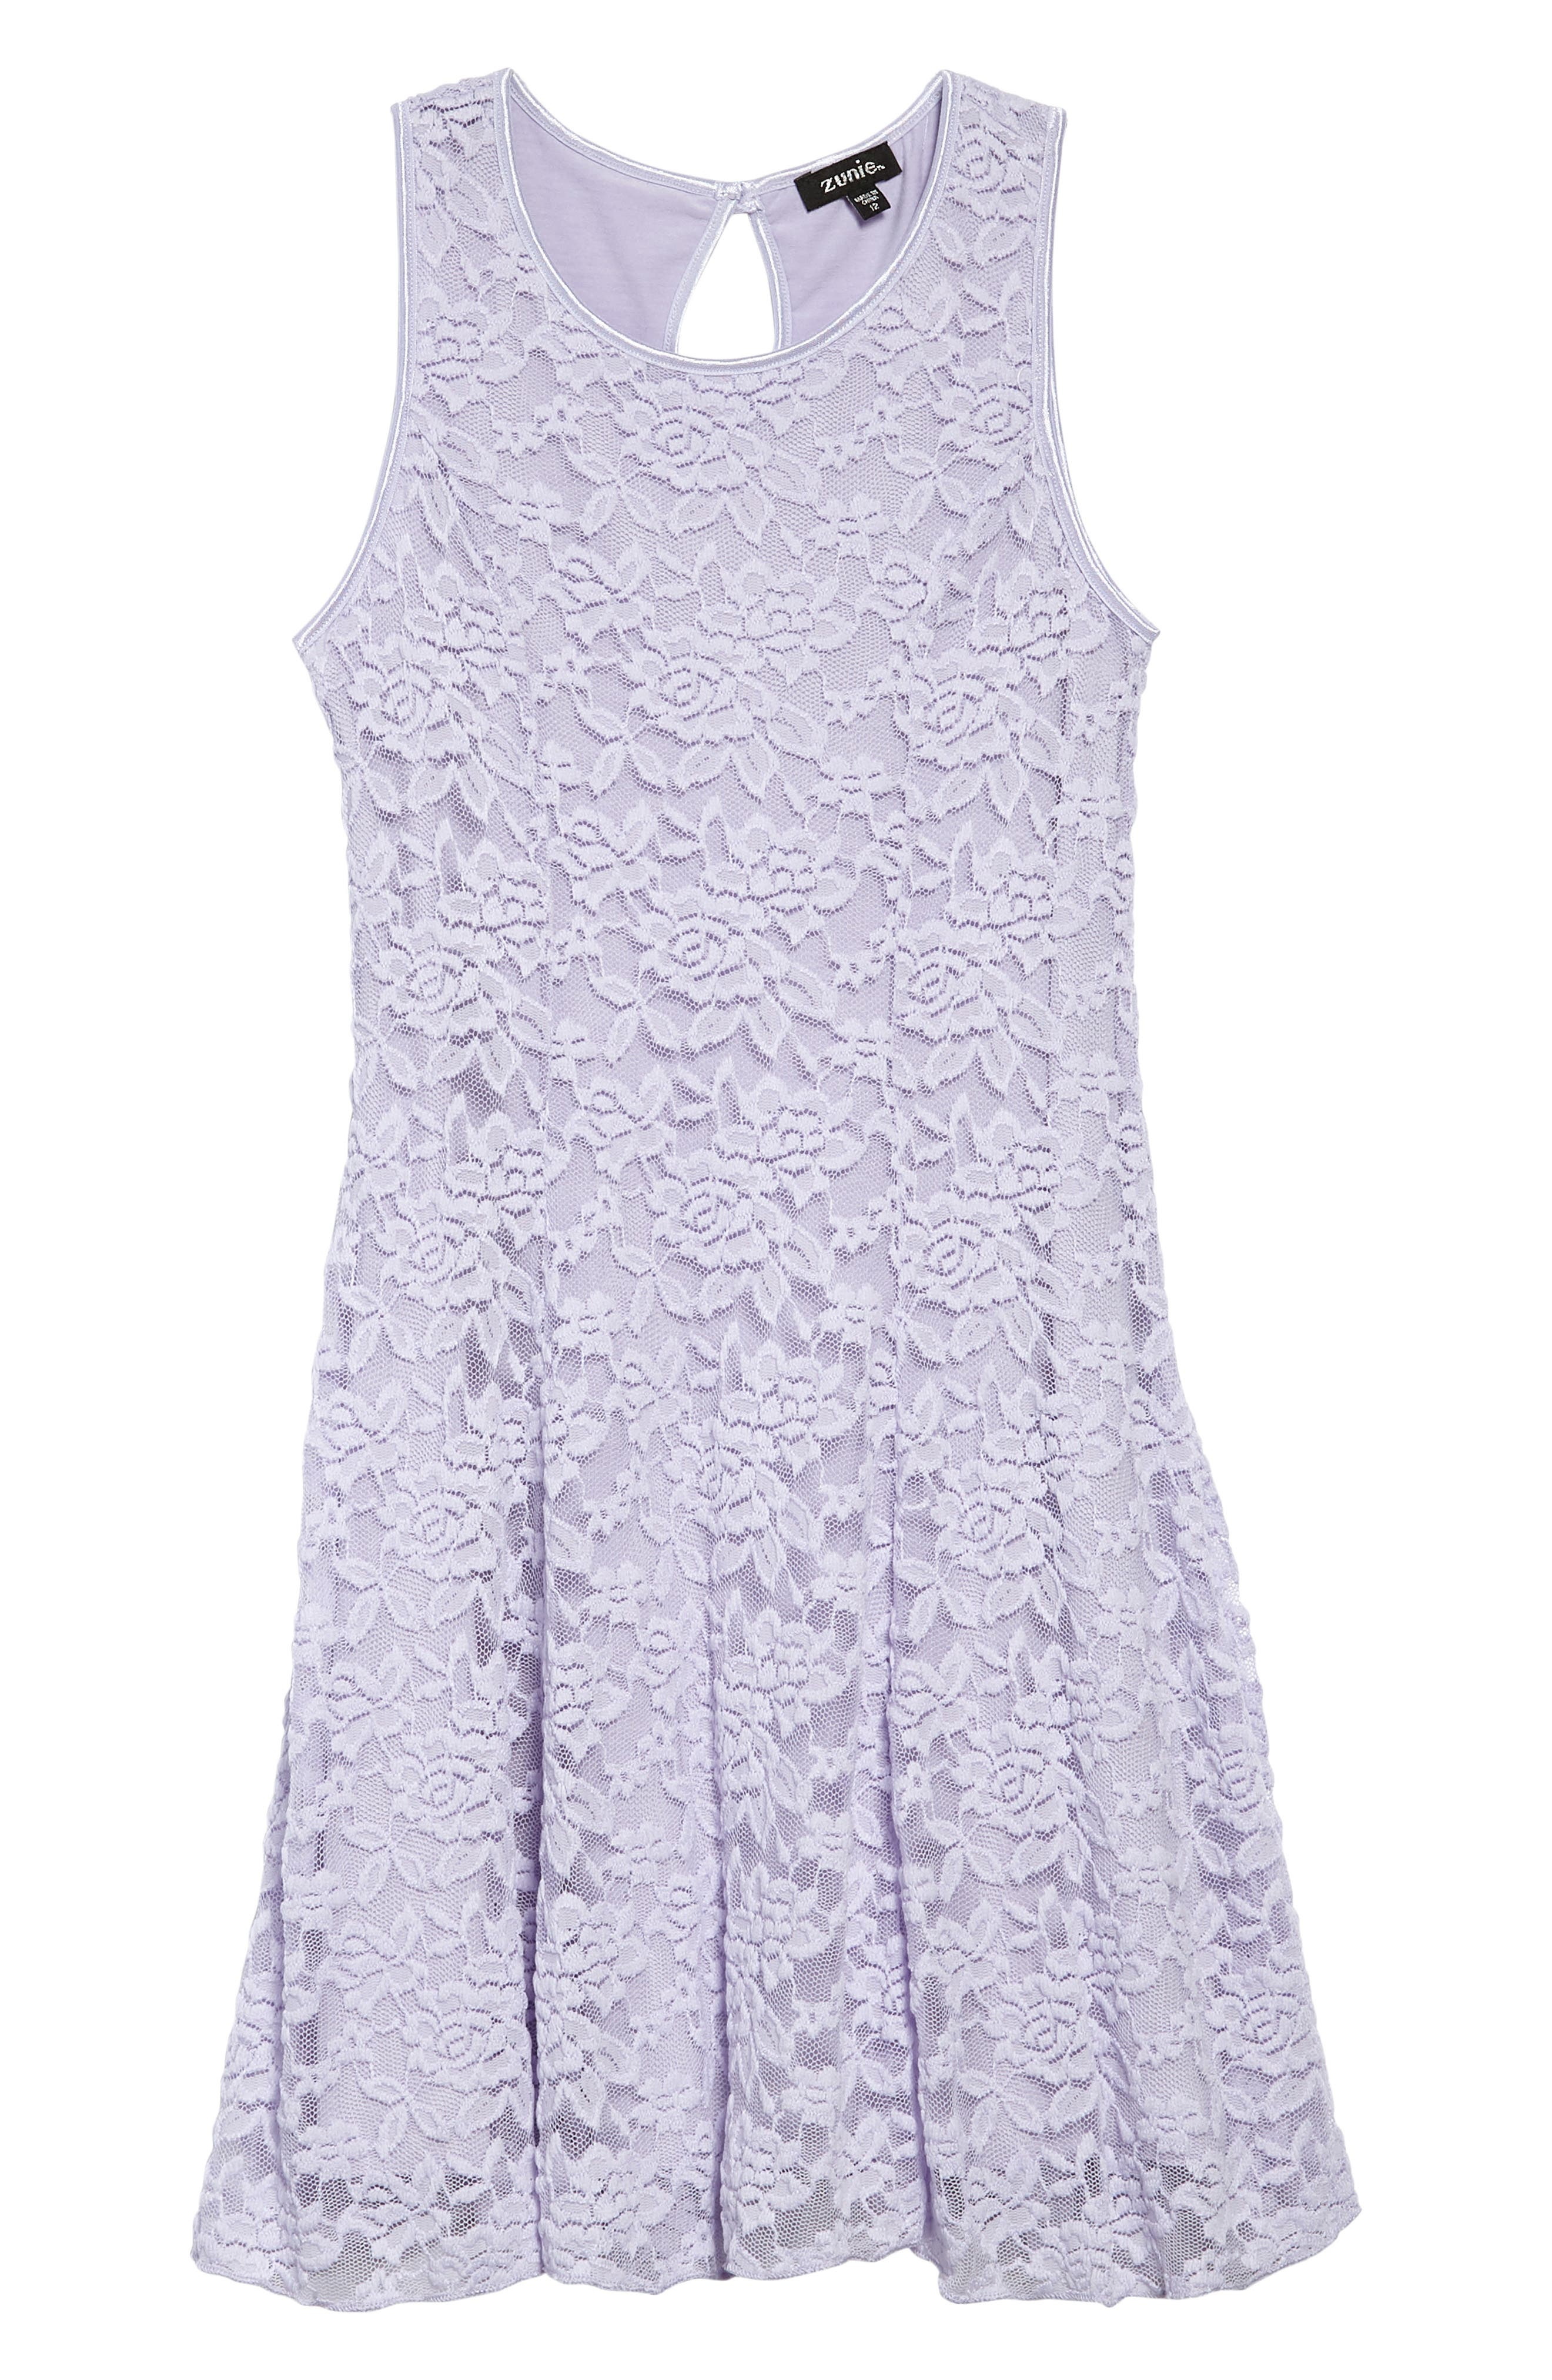 Floral Lace Sleeveless Dress,                             Main thumbnail 1, color,                             530